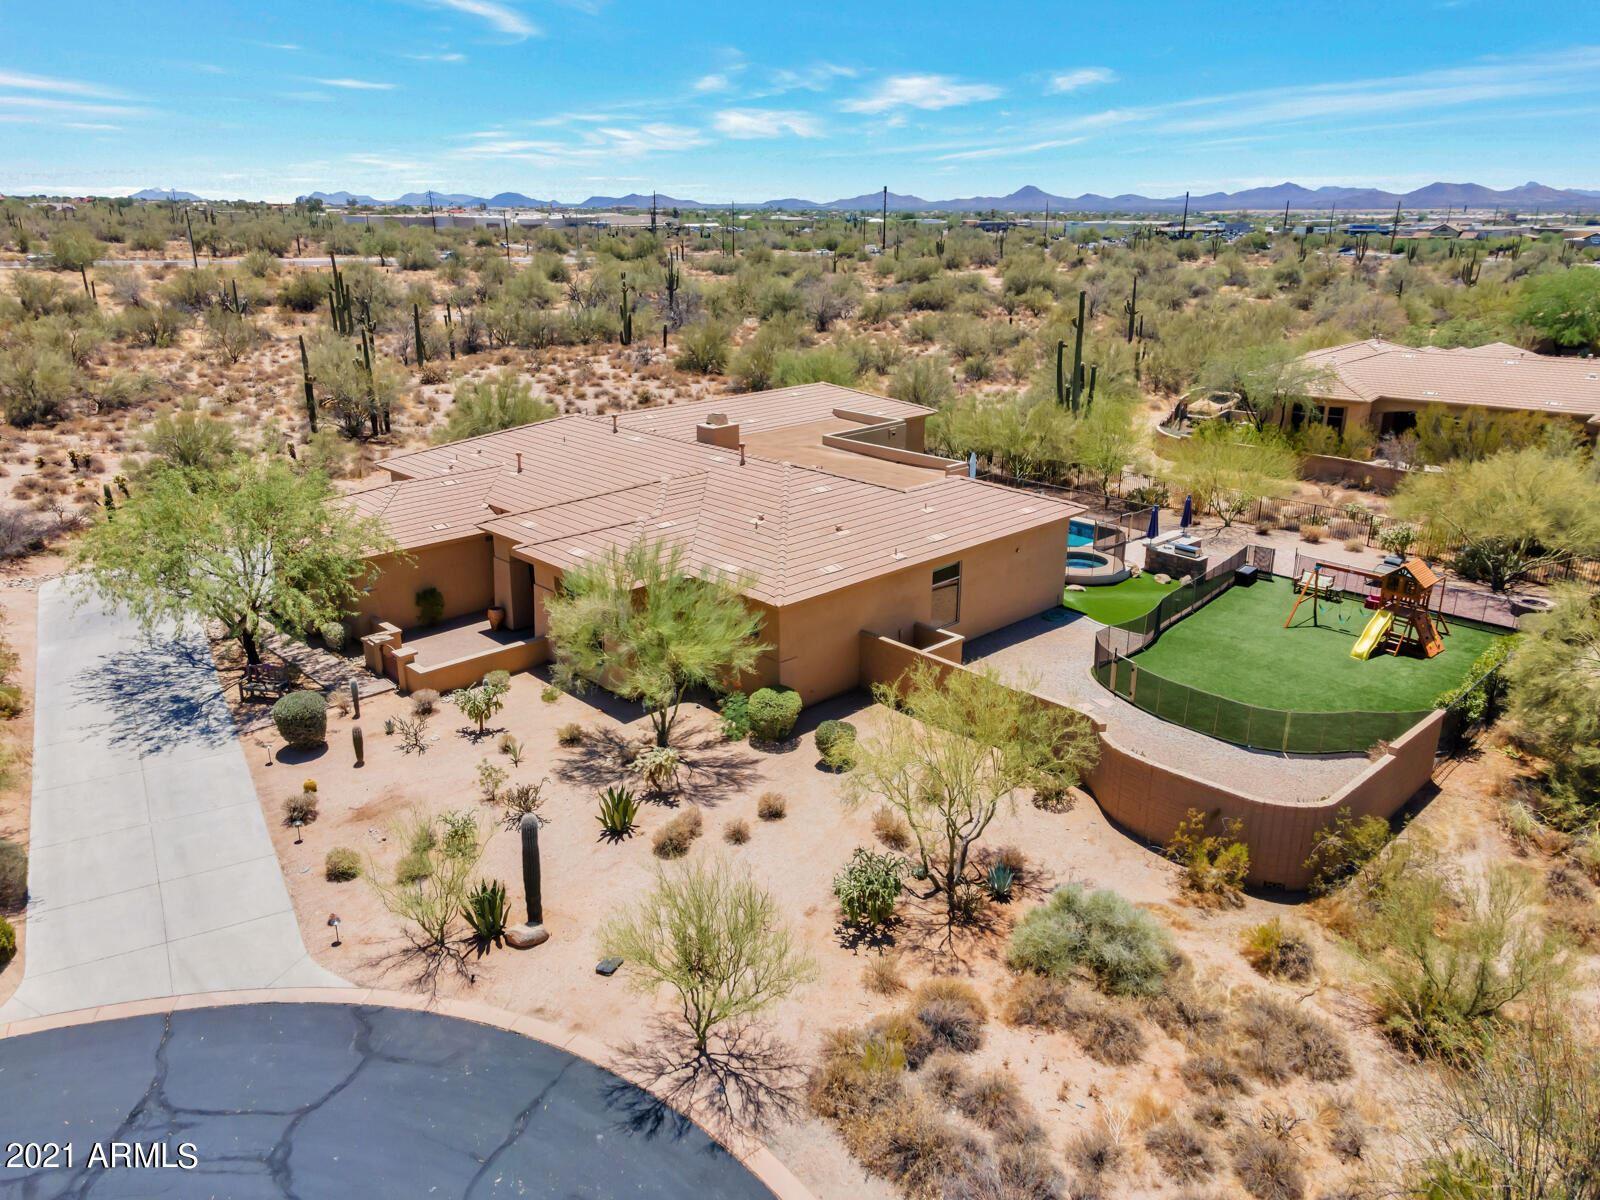 Photo of 34830 N DESERT WINDS Circle, Carefree, AZ 85377 (MLS # 6256886)